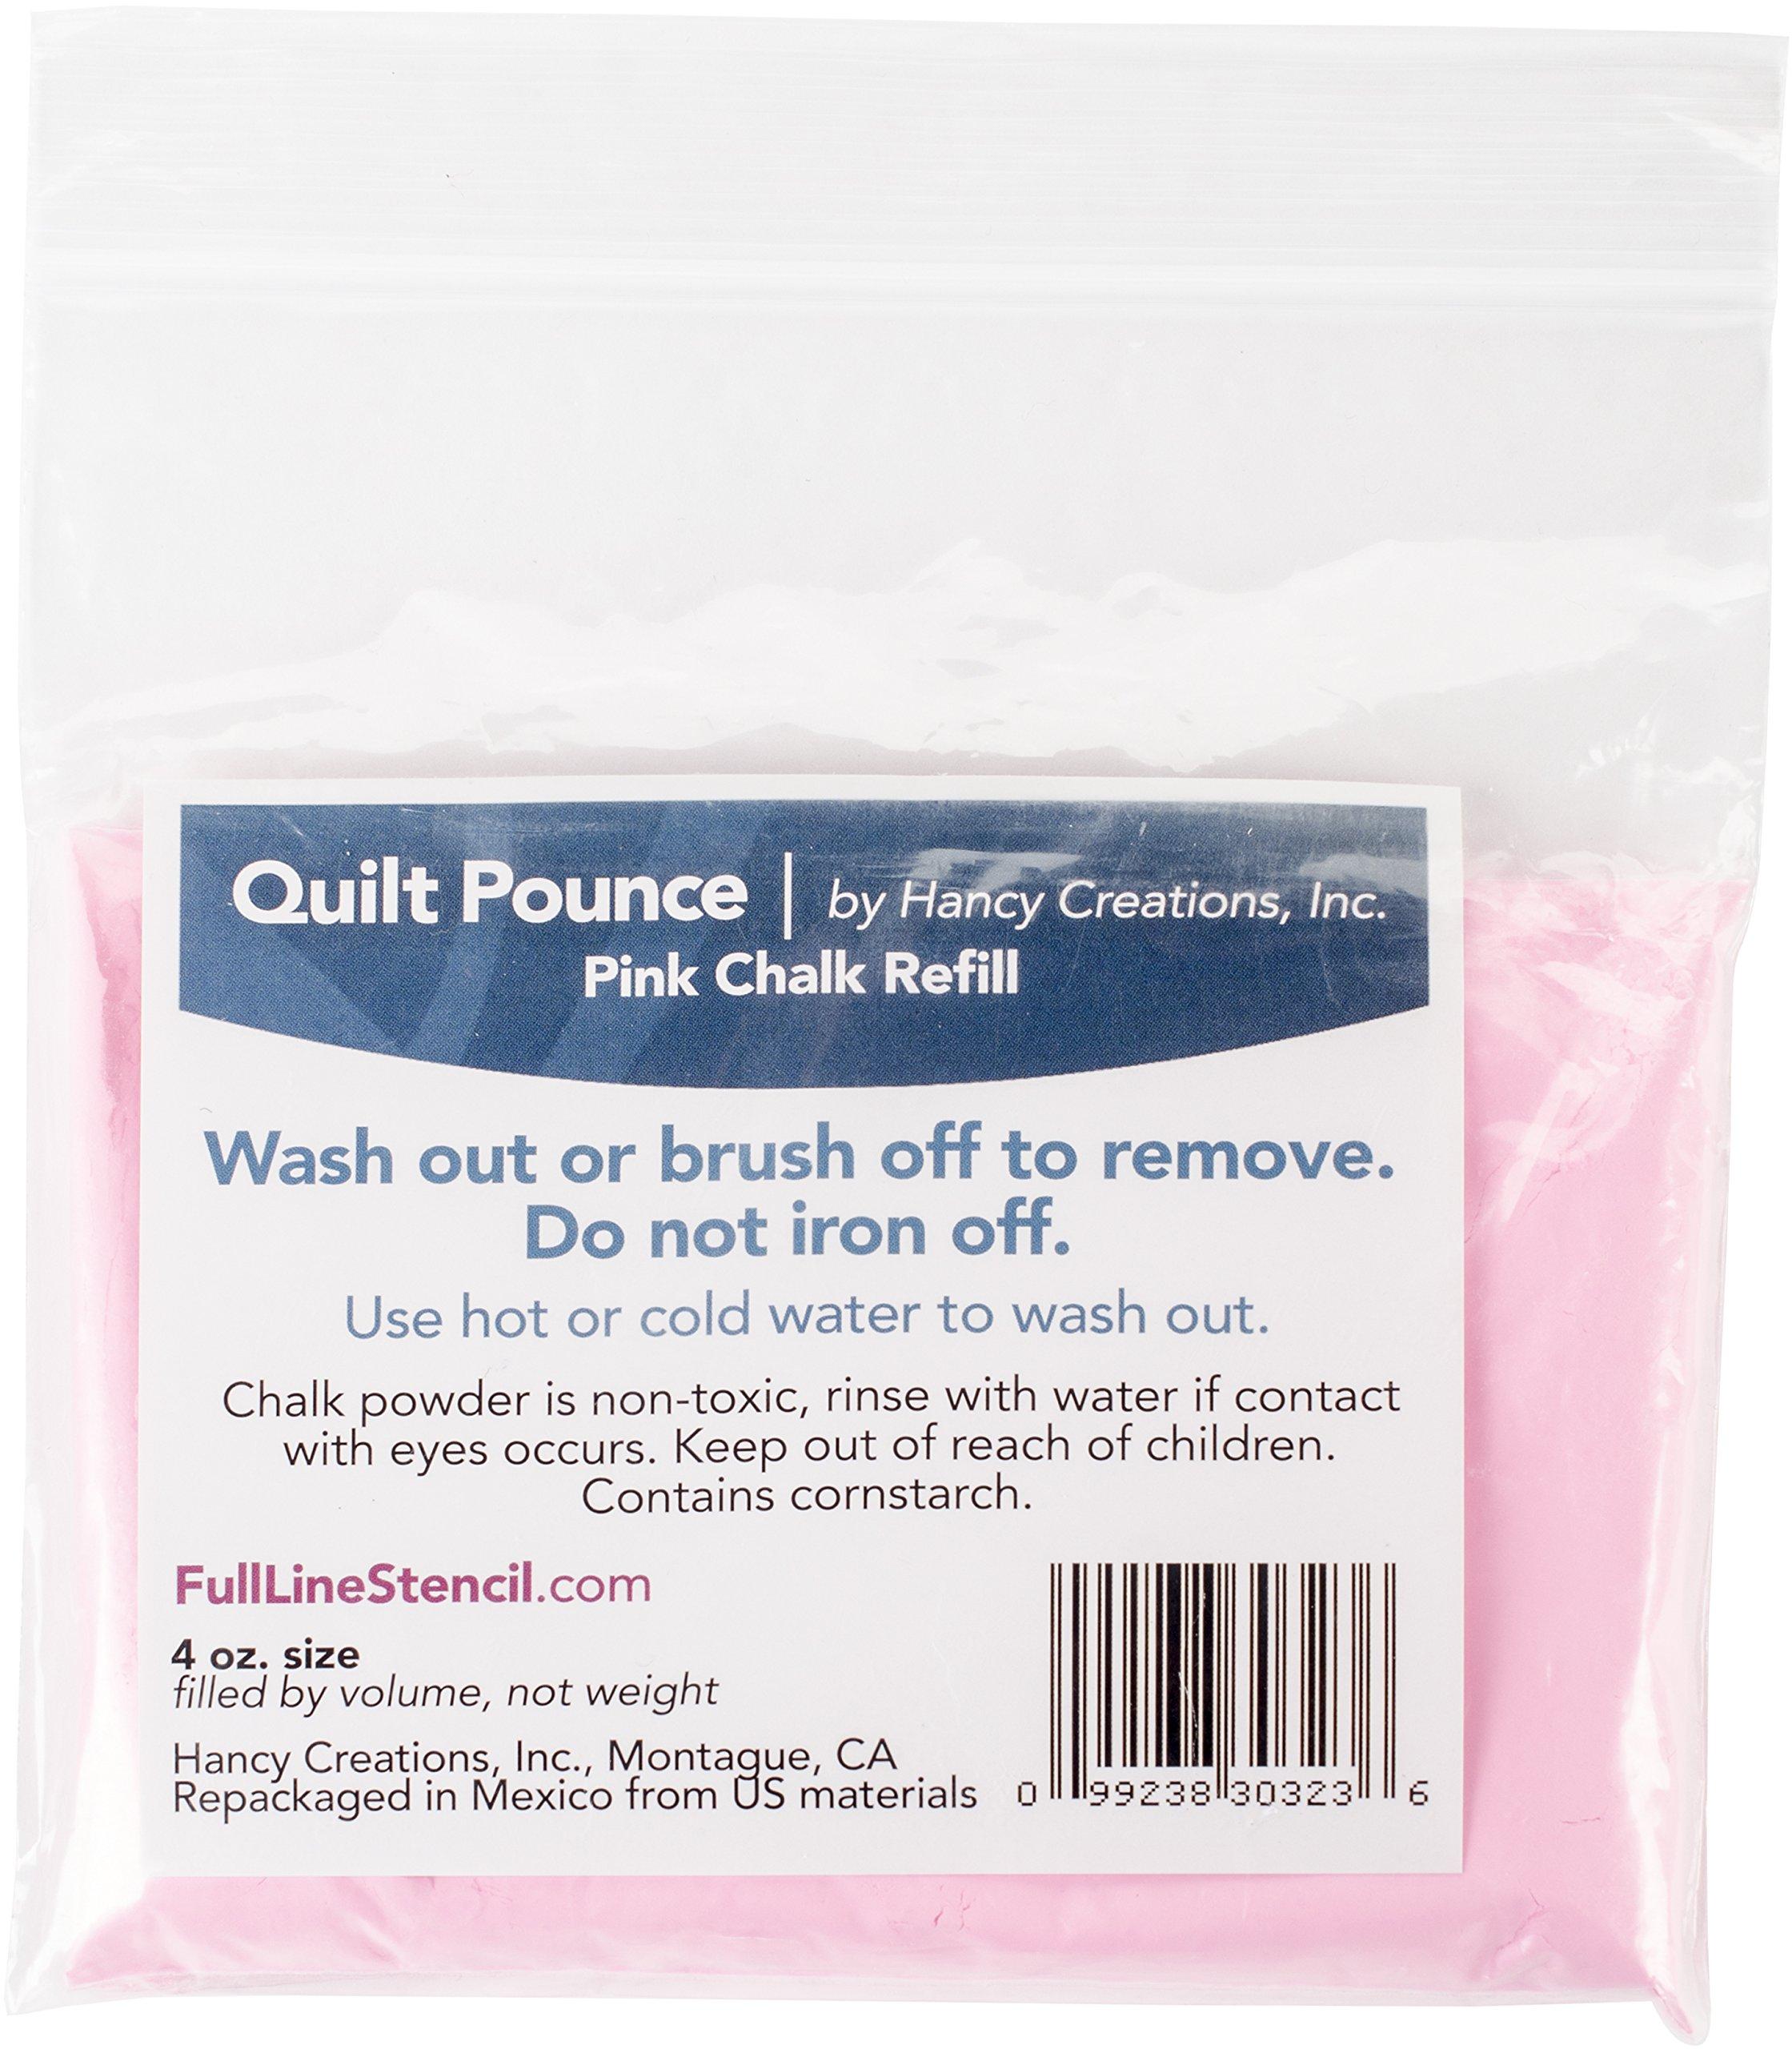 Quilt Pounce Chalk Refill, 4oz Pink